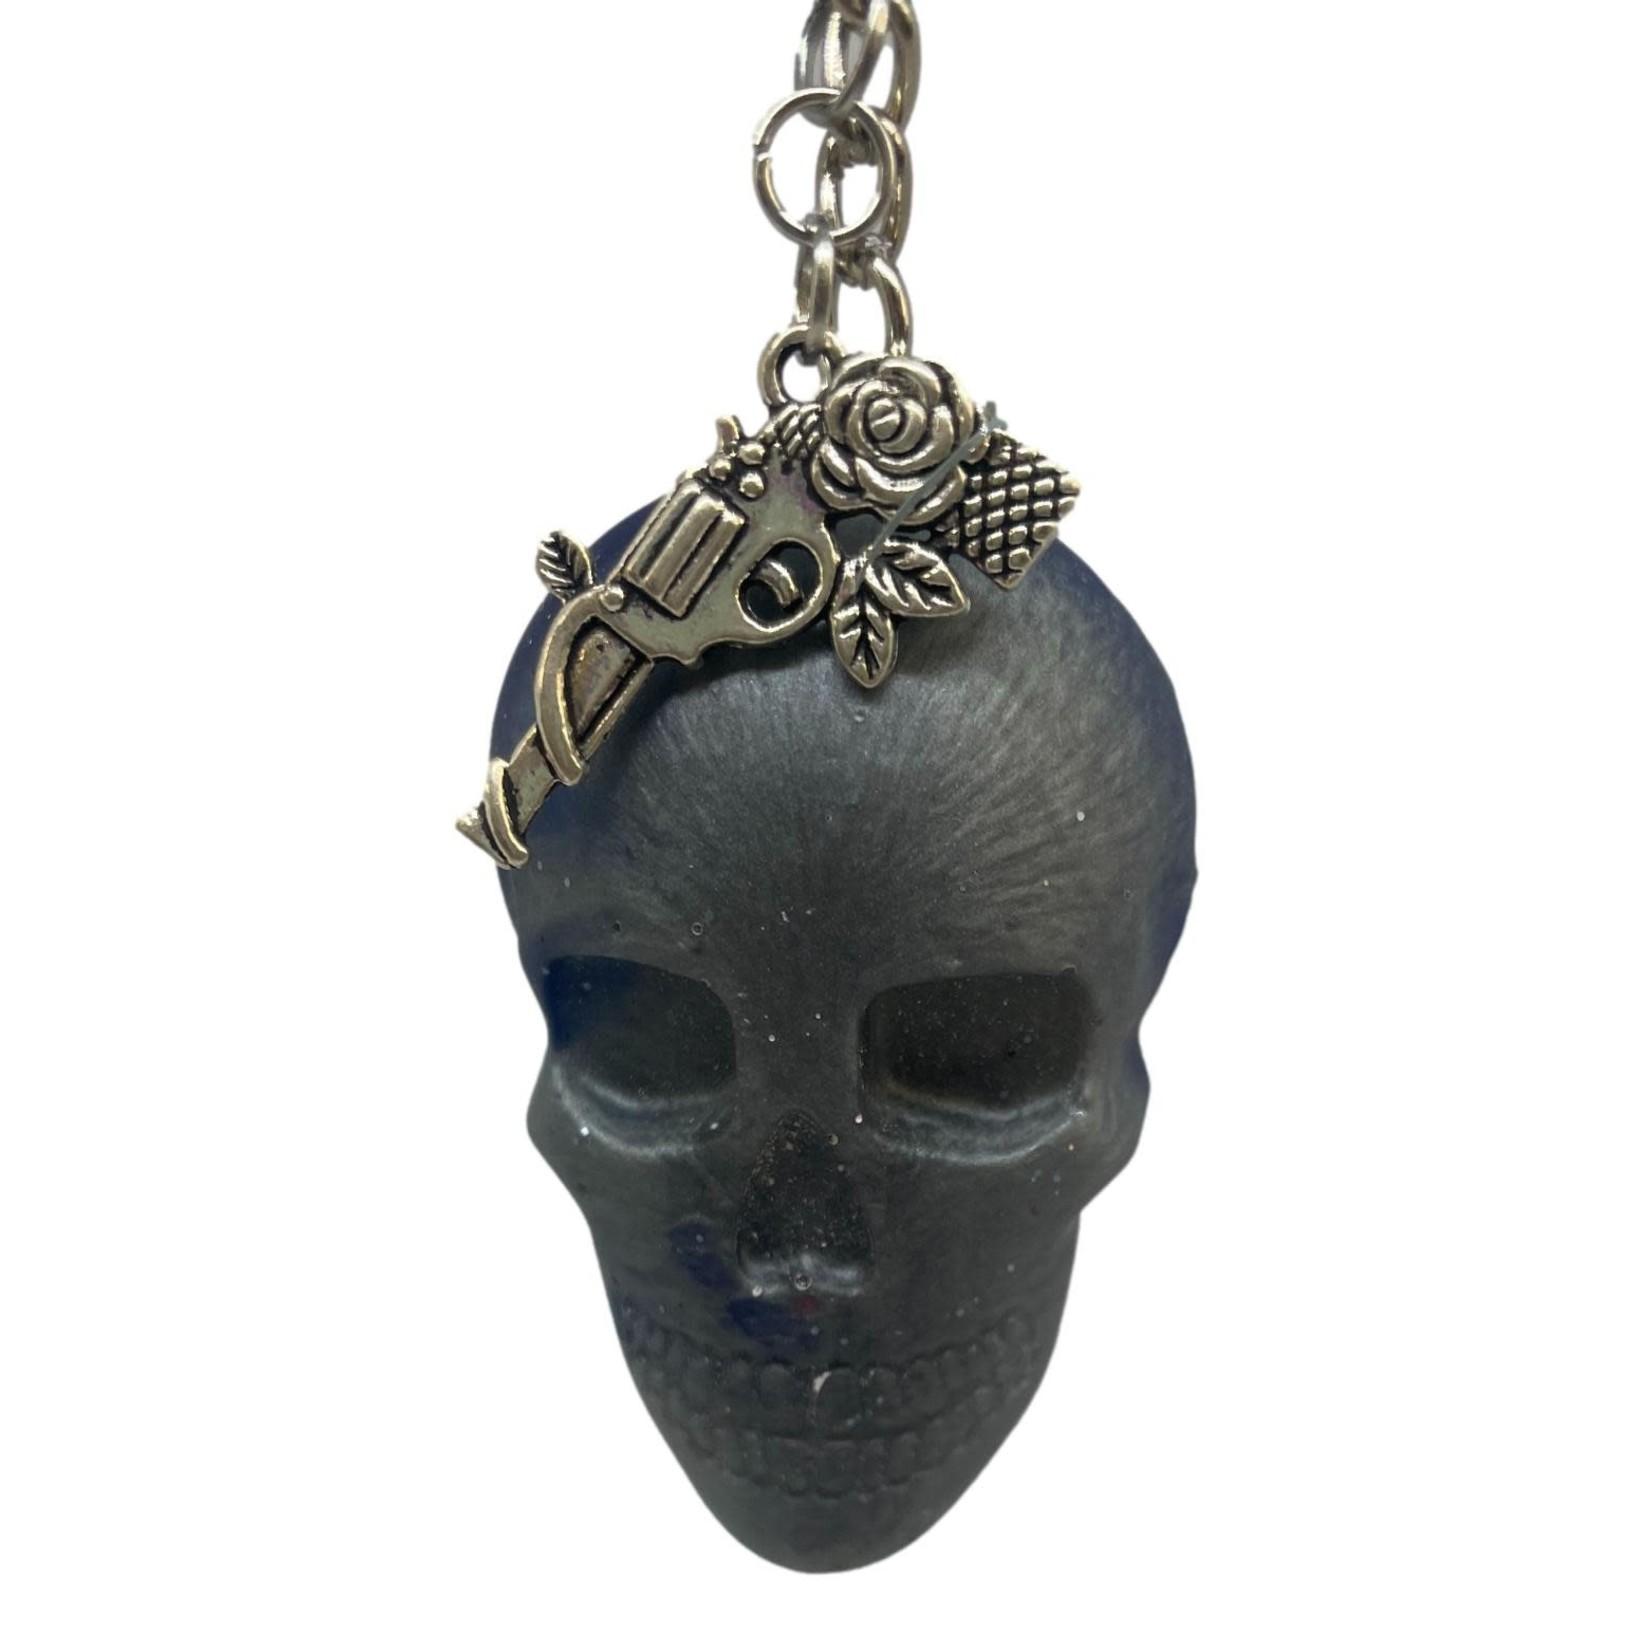 East Coast Sirens Grey & Blue Skull Keychain